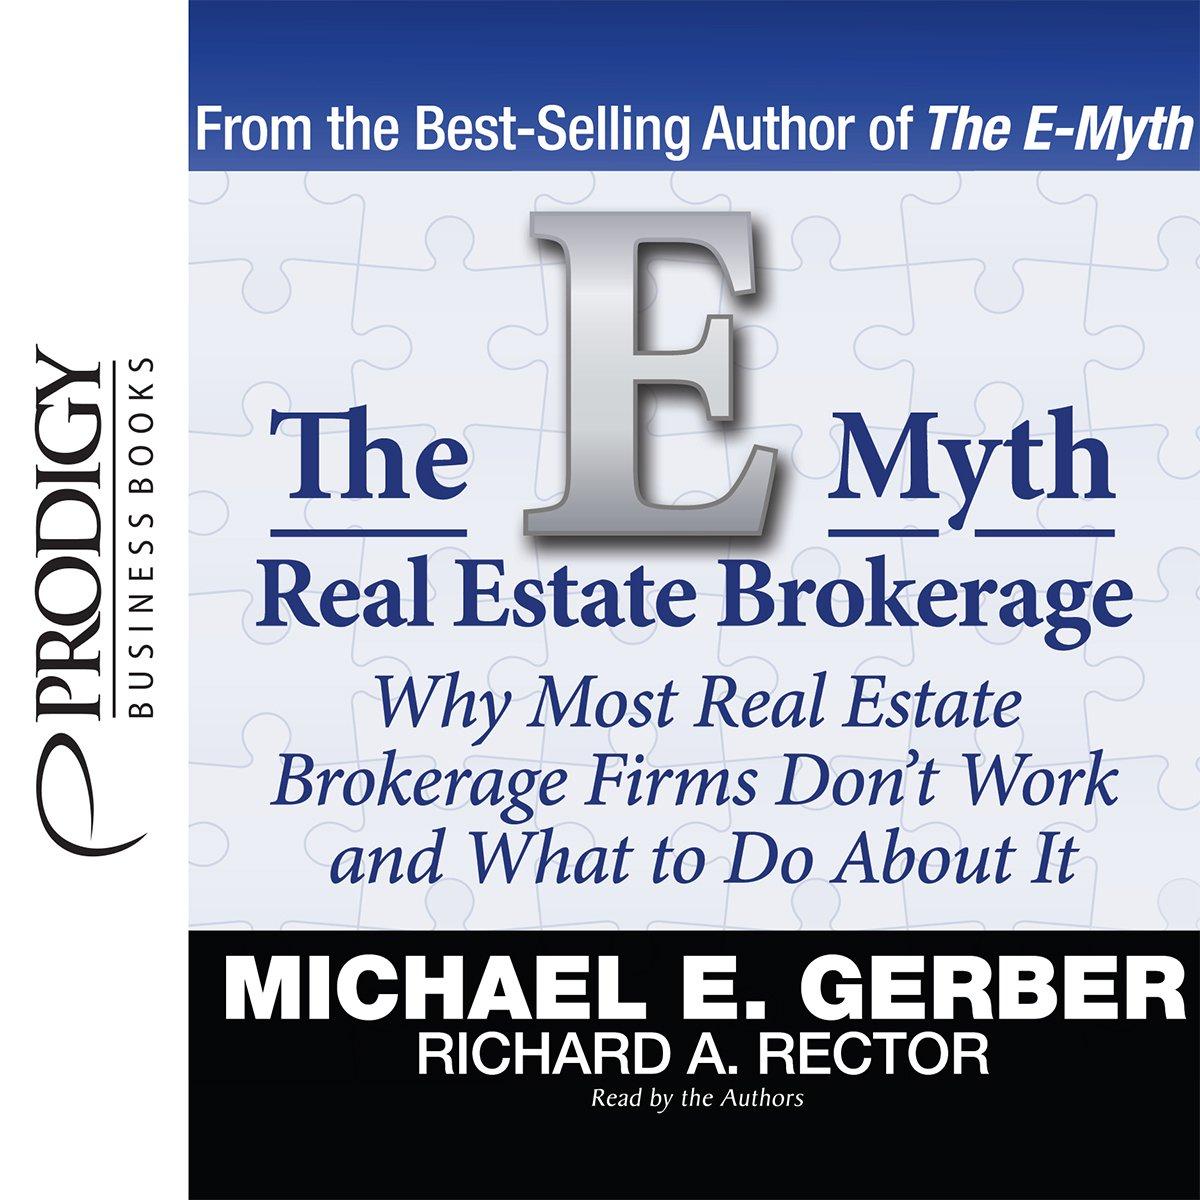 The E-Myth Real Estate Brokerage